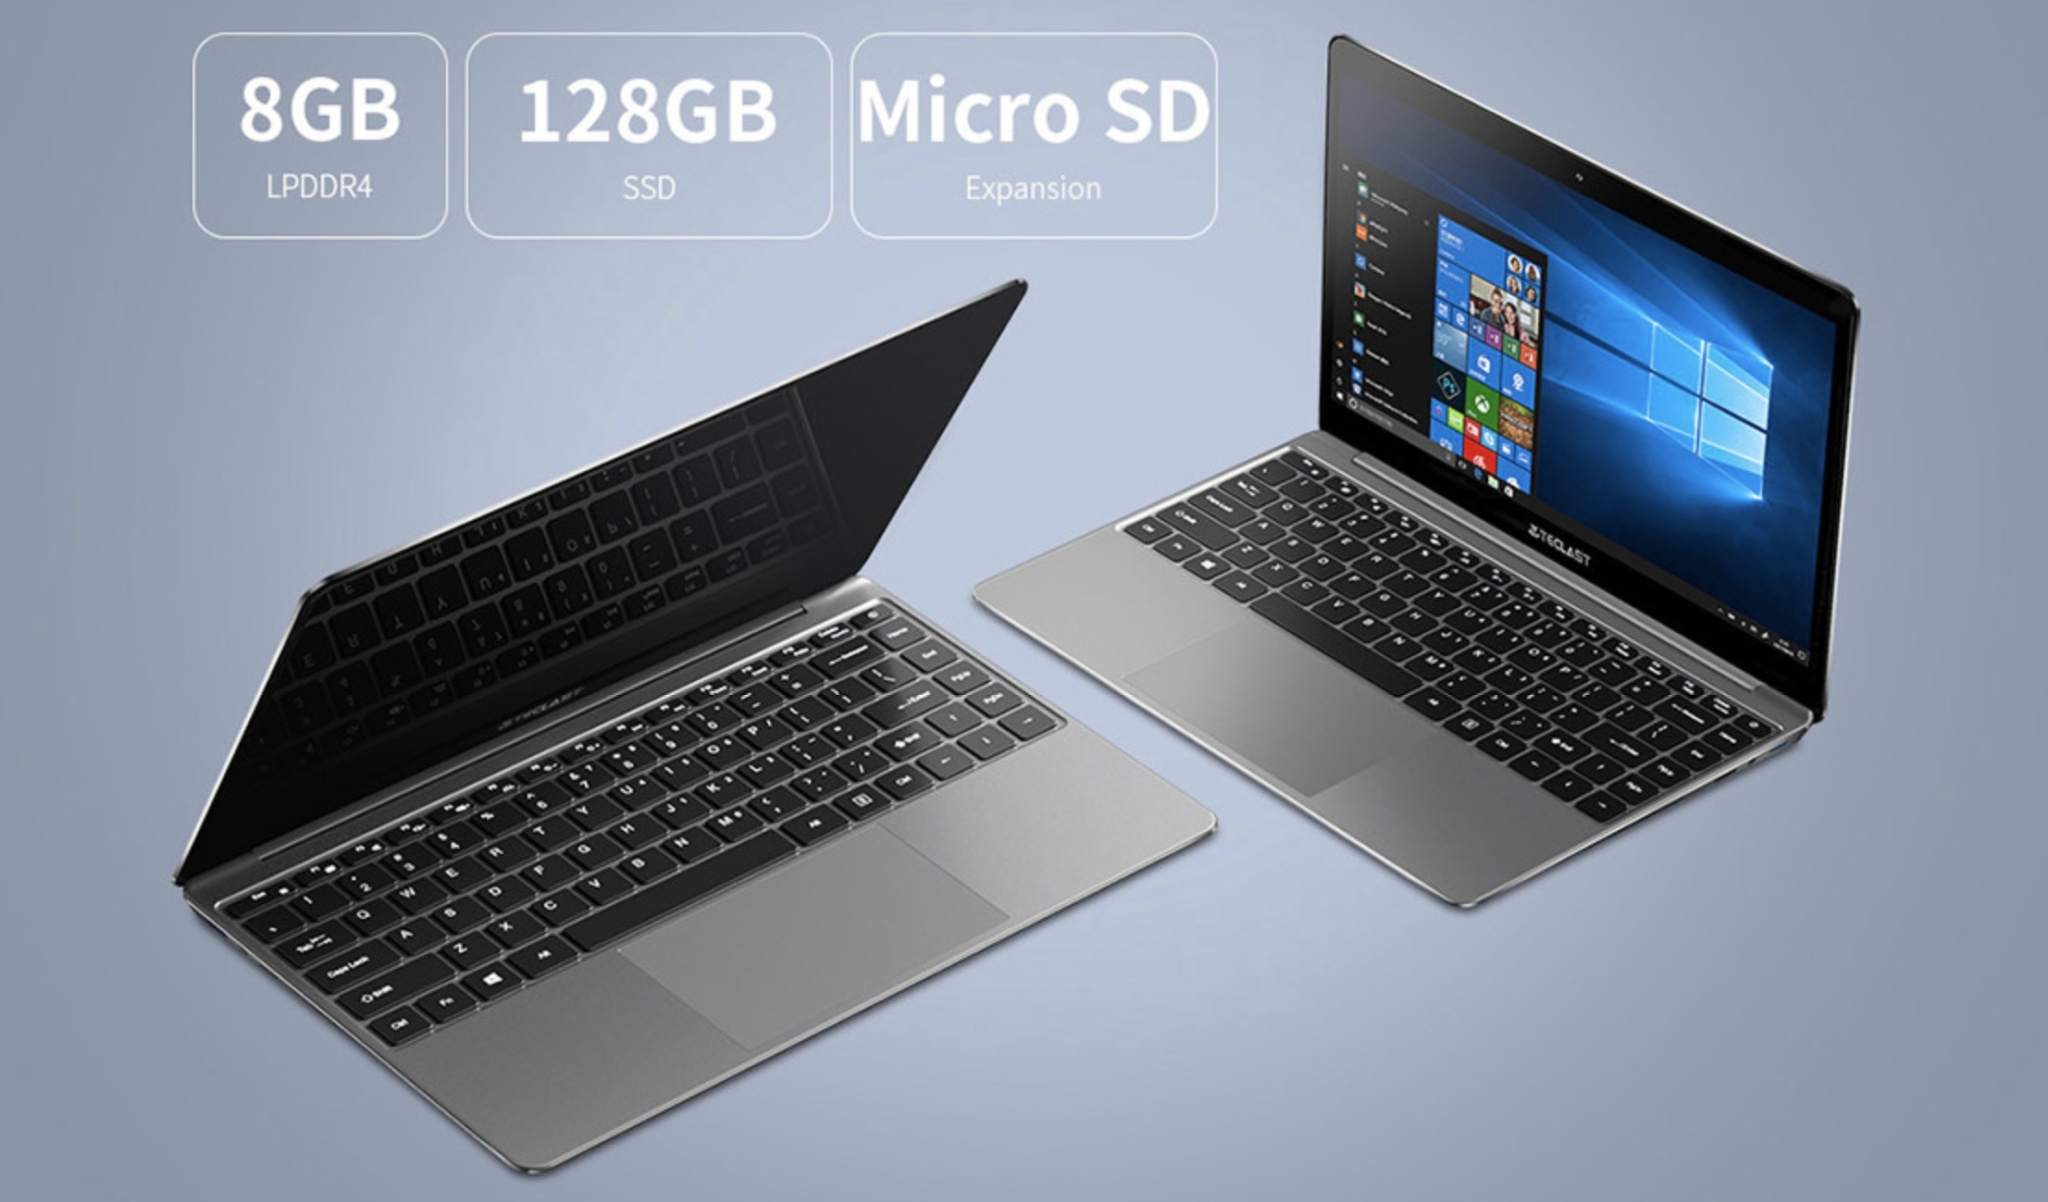 Skvělý notebook Teclast F7 Plus nyní za pár korun! [sponzorovaný článek]